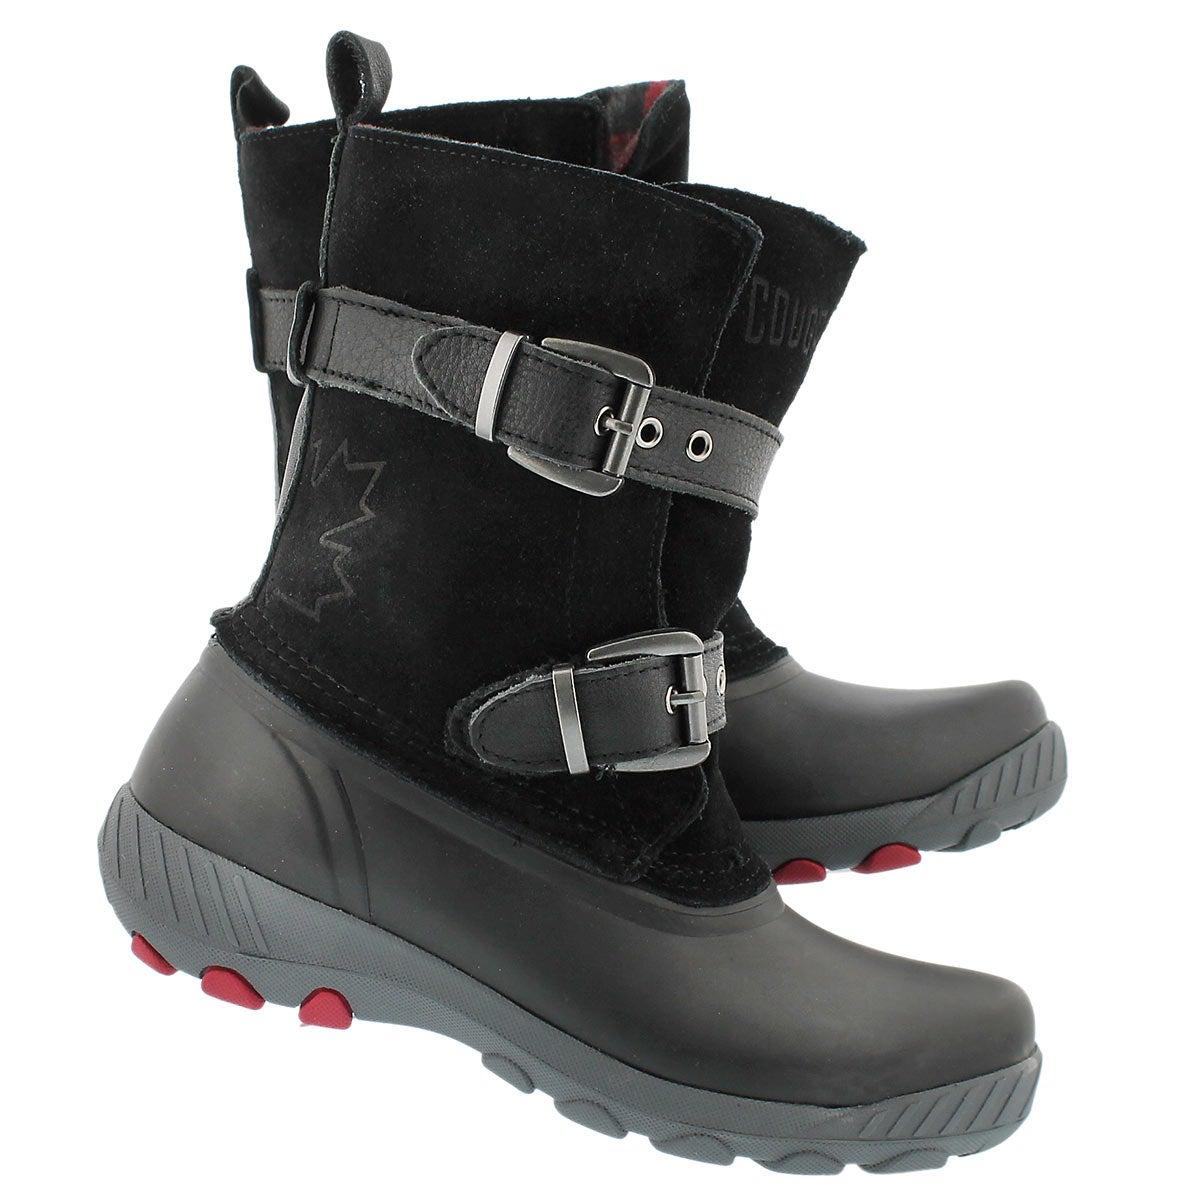 Lds Maple Creek blk wtprf pull wntr boot